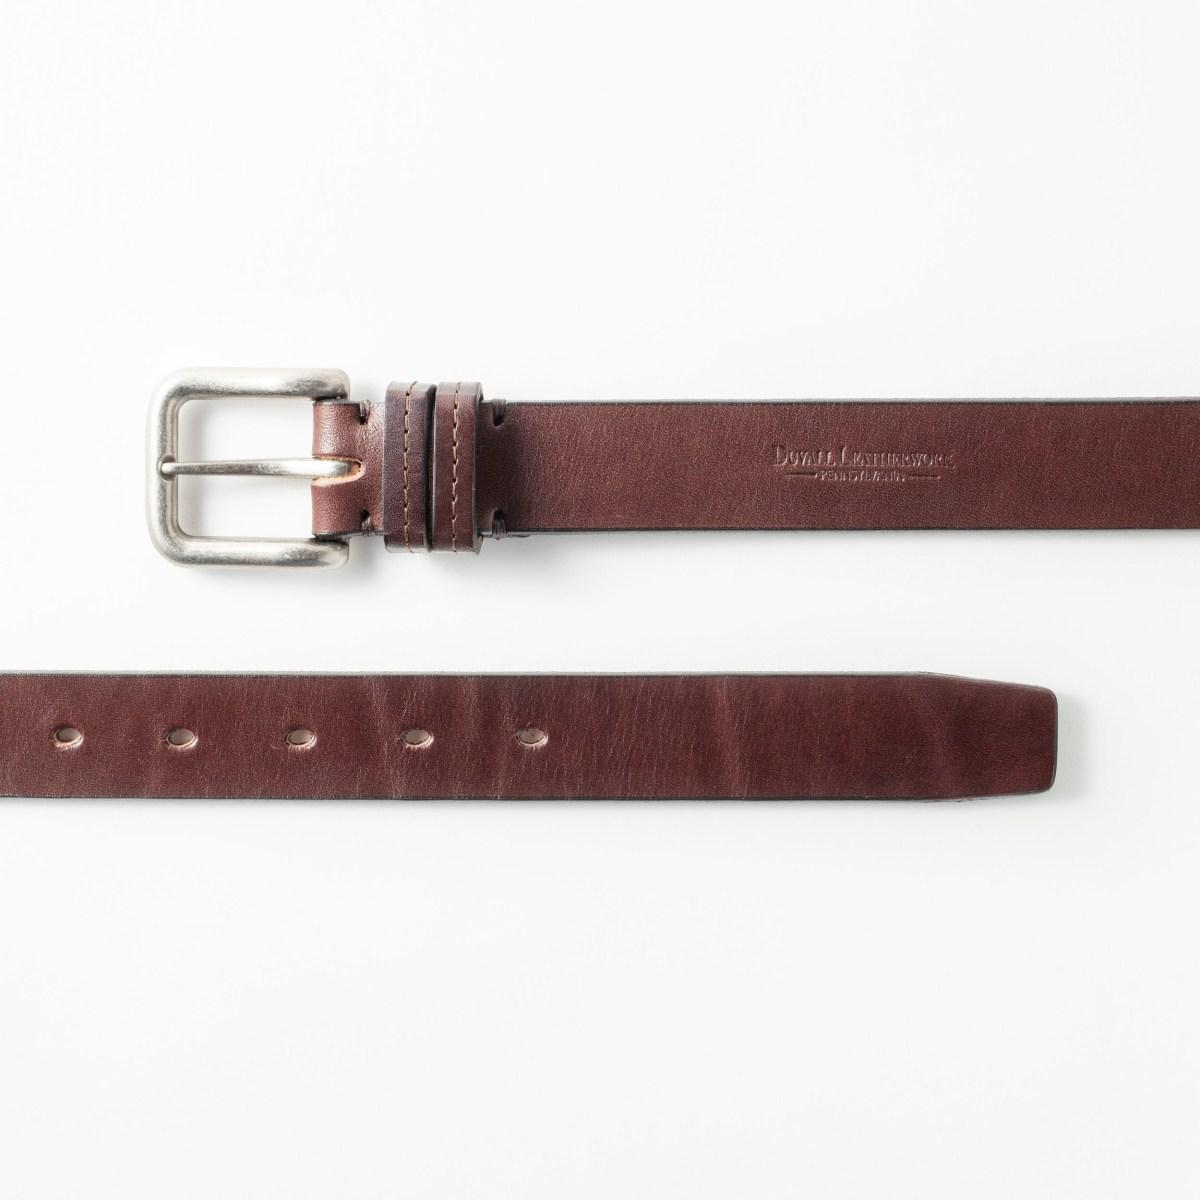 A smoky, dark leather belt.